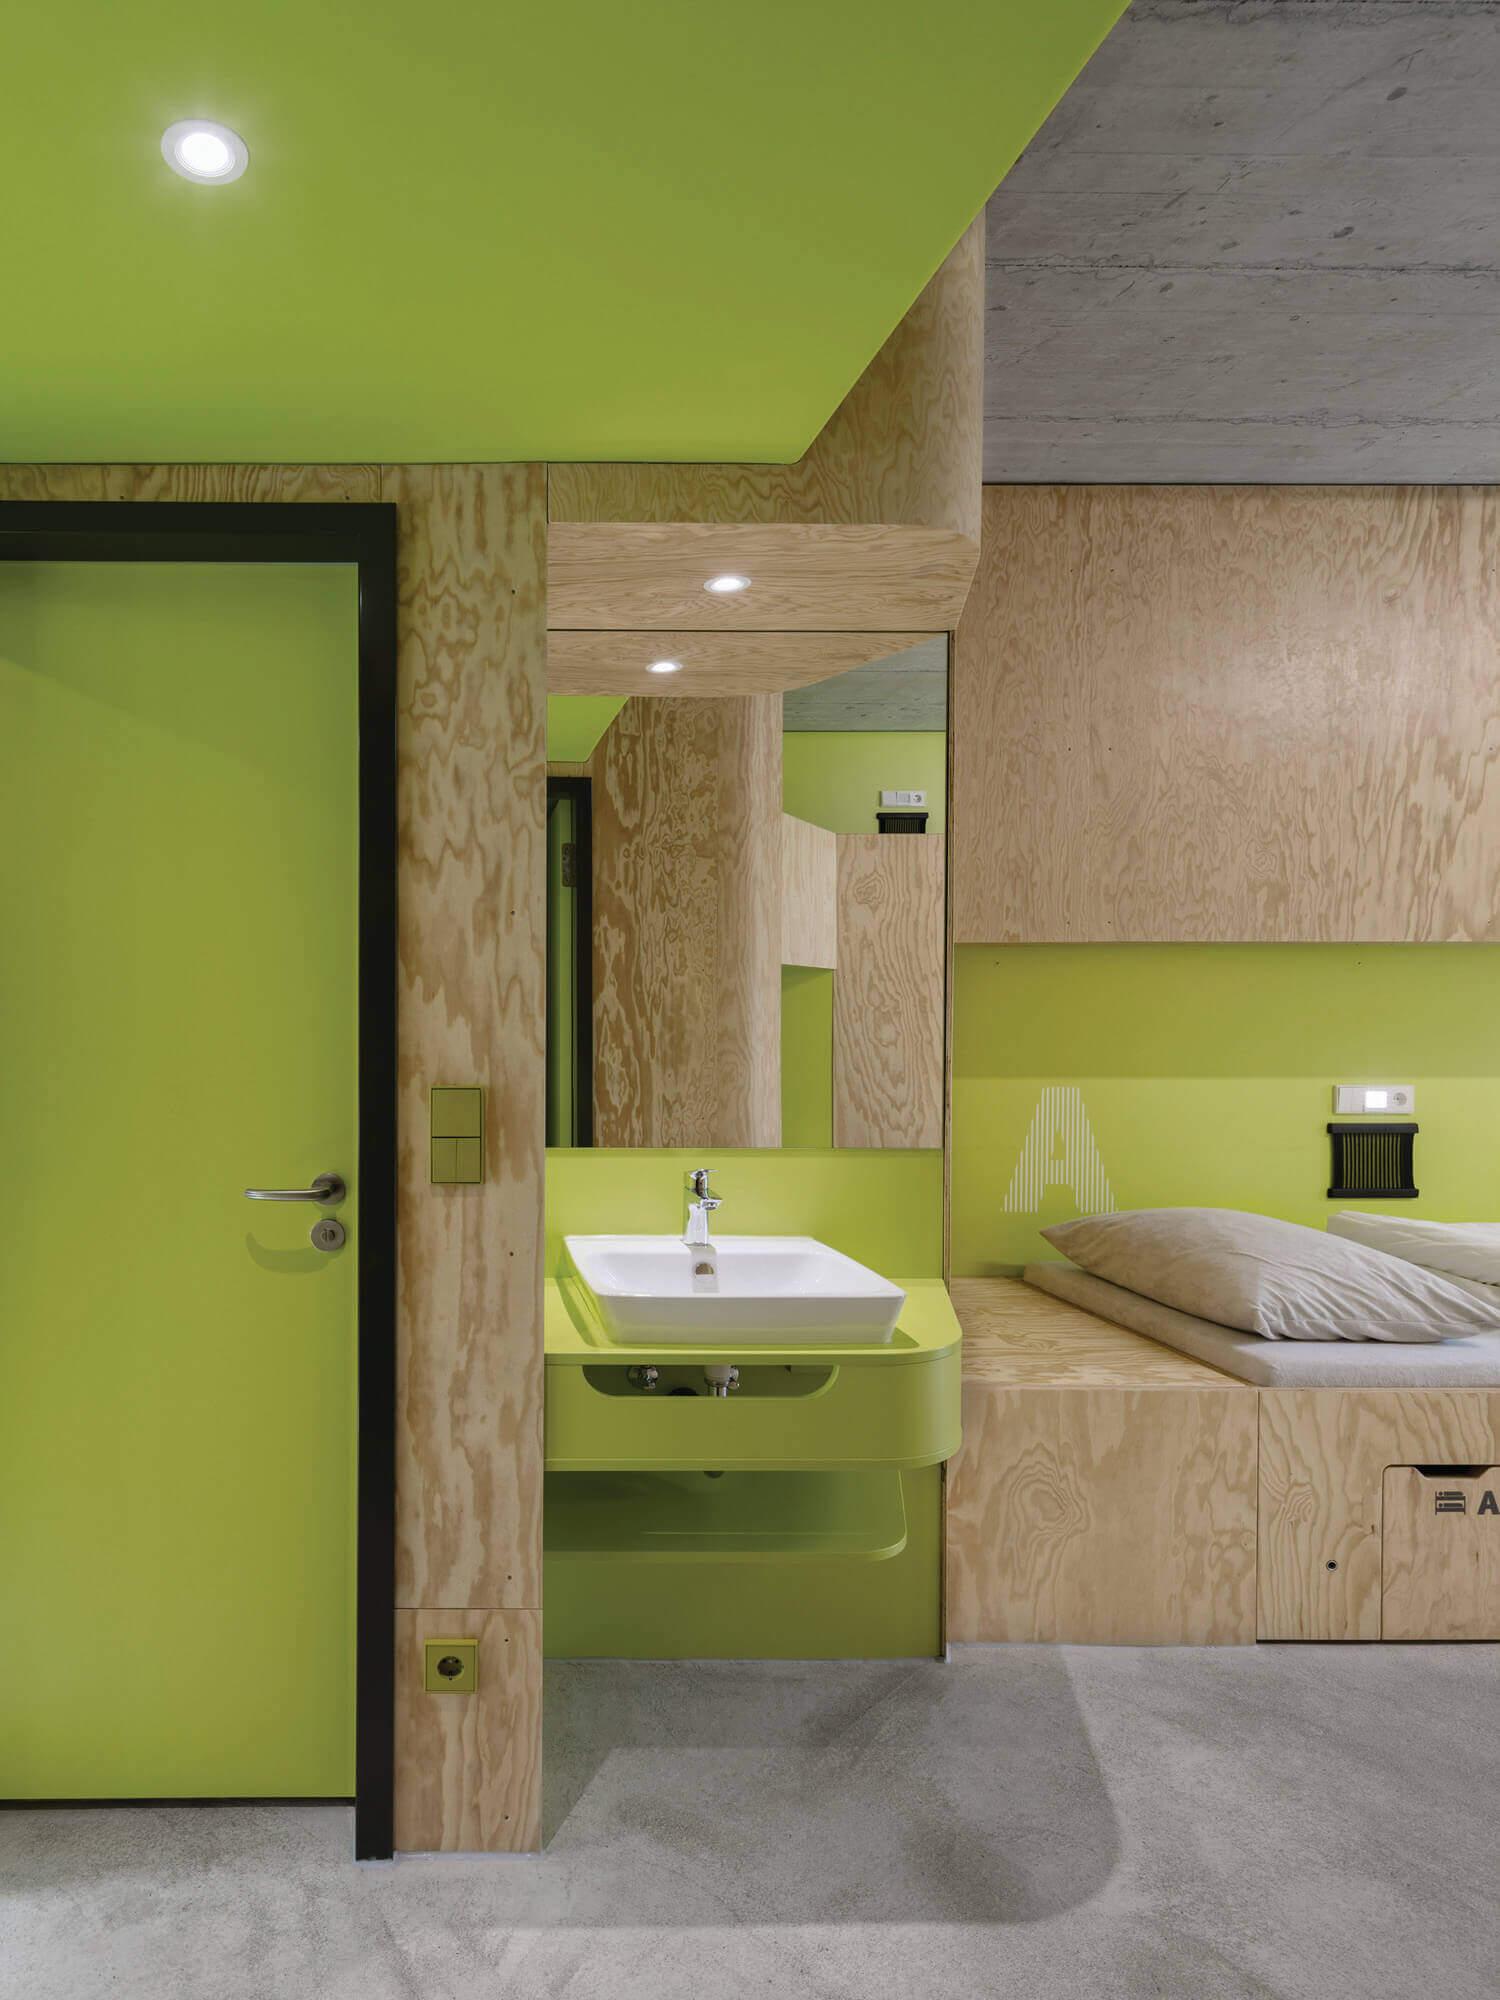 Modular Bedroom Unit 2 W.Huthmacher